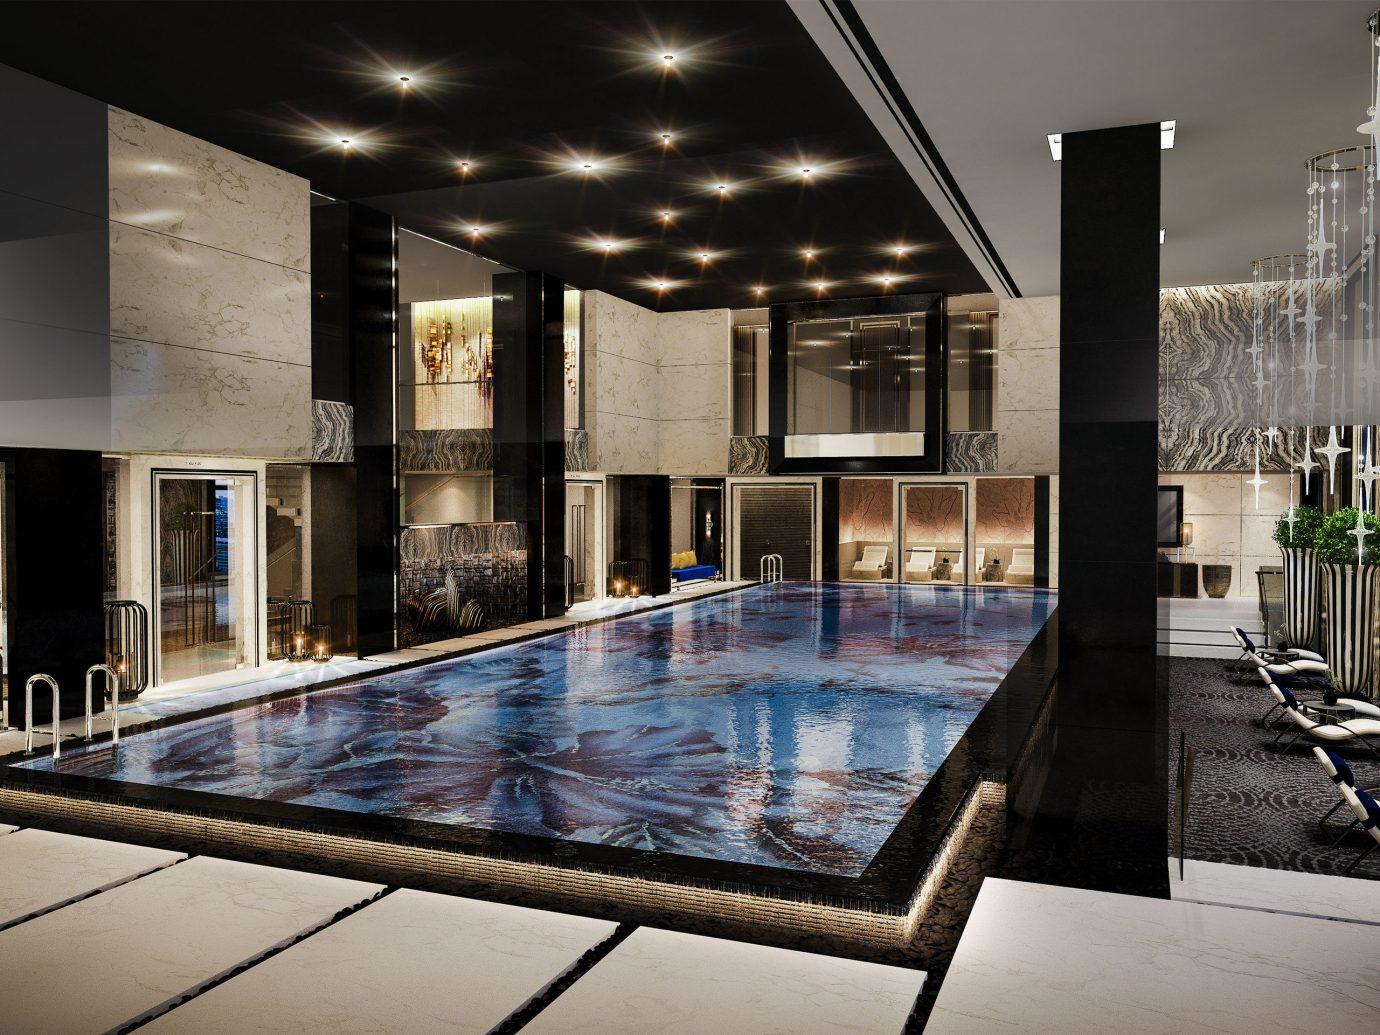 Boutique Hotels Luxury Travel ceiling indoor interior design Architecture condominium apartment Lobby swimming pool real estate daylighting penthouse apartment house estate amenity